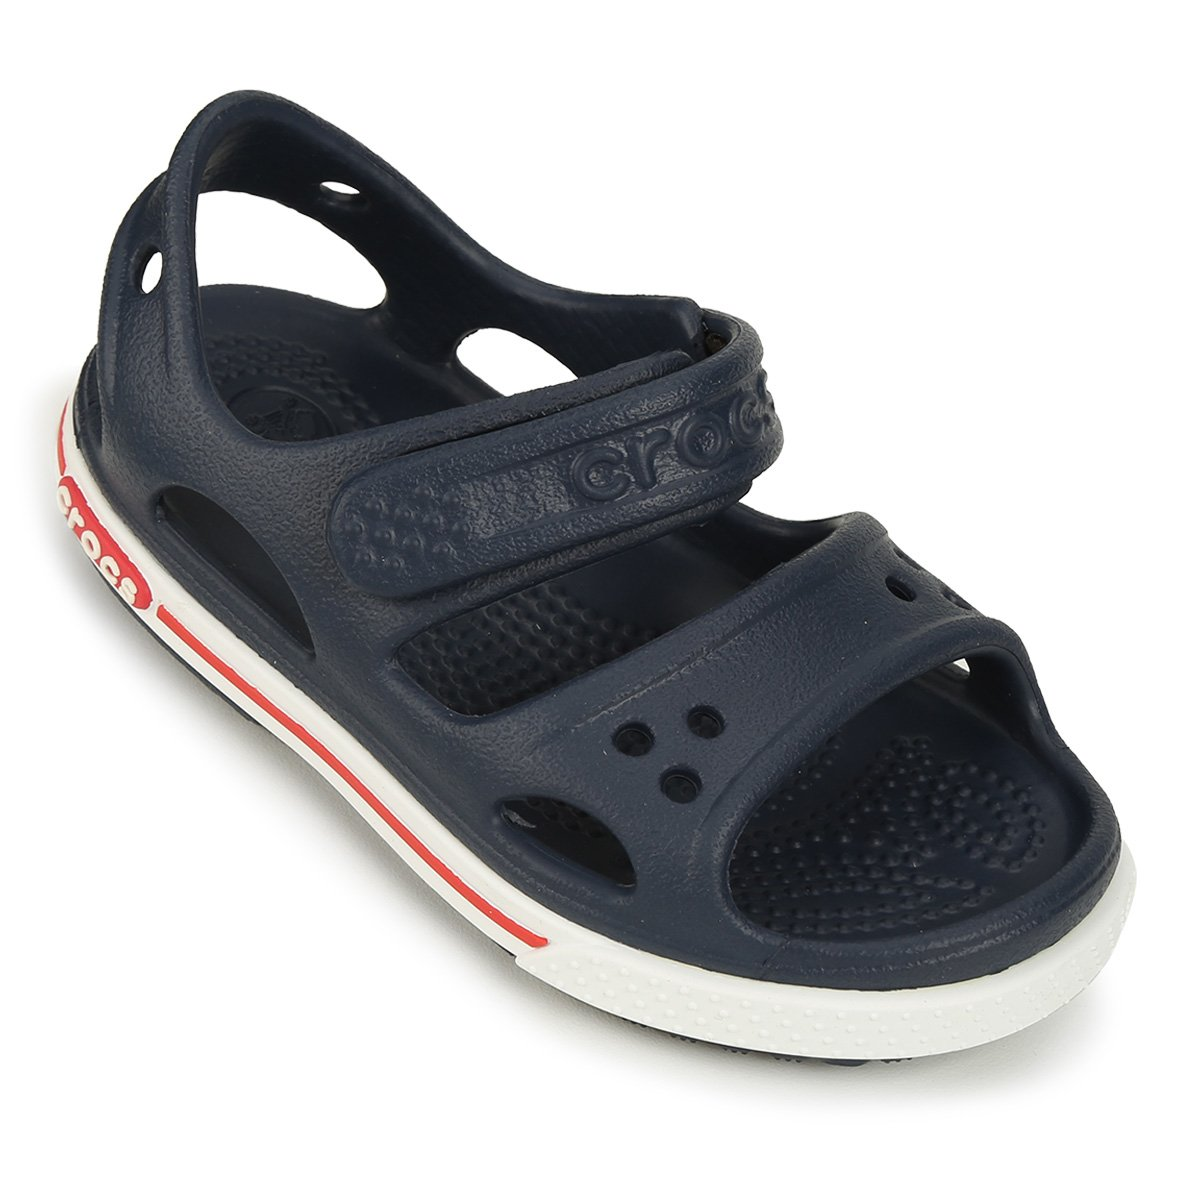 Sandália Crocs Infantil Crocband II PS - Marinho - Compre Agora ... 4a9b1c33c9